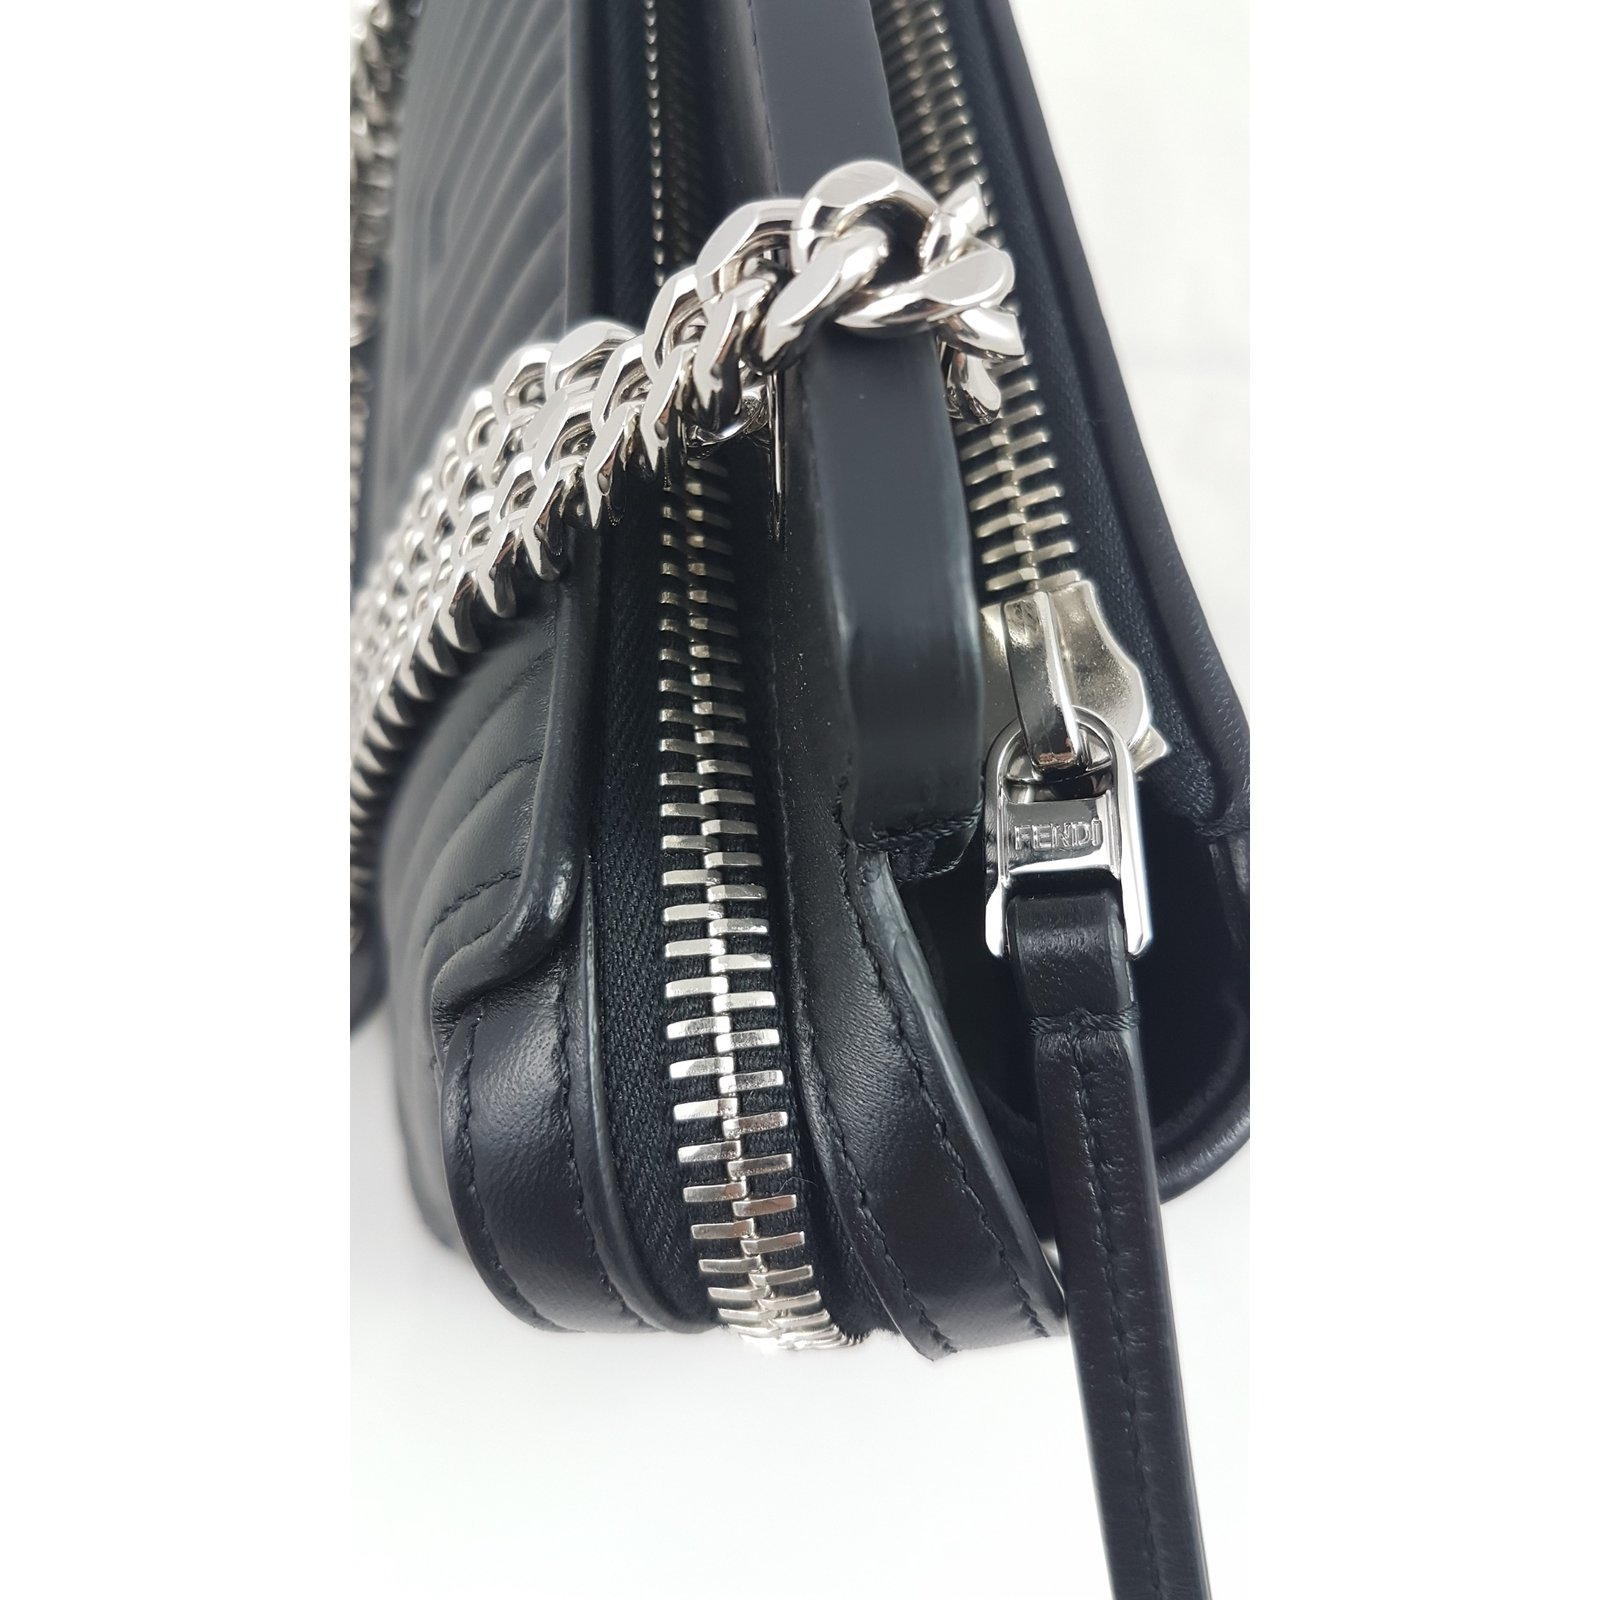 365098bdf5 Fendi BLACK DOTCOM QUILTED LEATHER SMALL SHOULDER BAG Handbags Leather  Black ref.59430 - Joli Closet